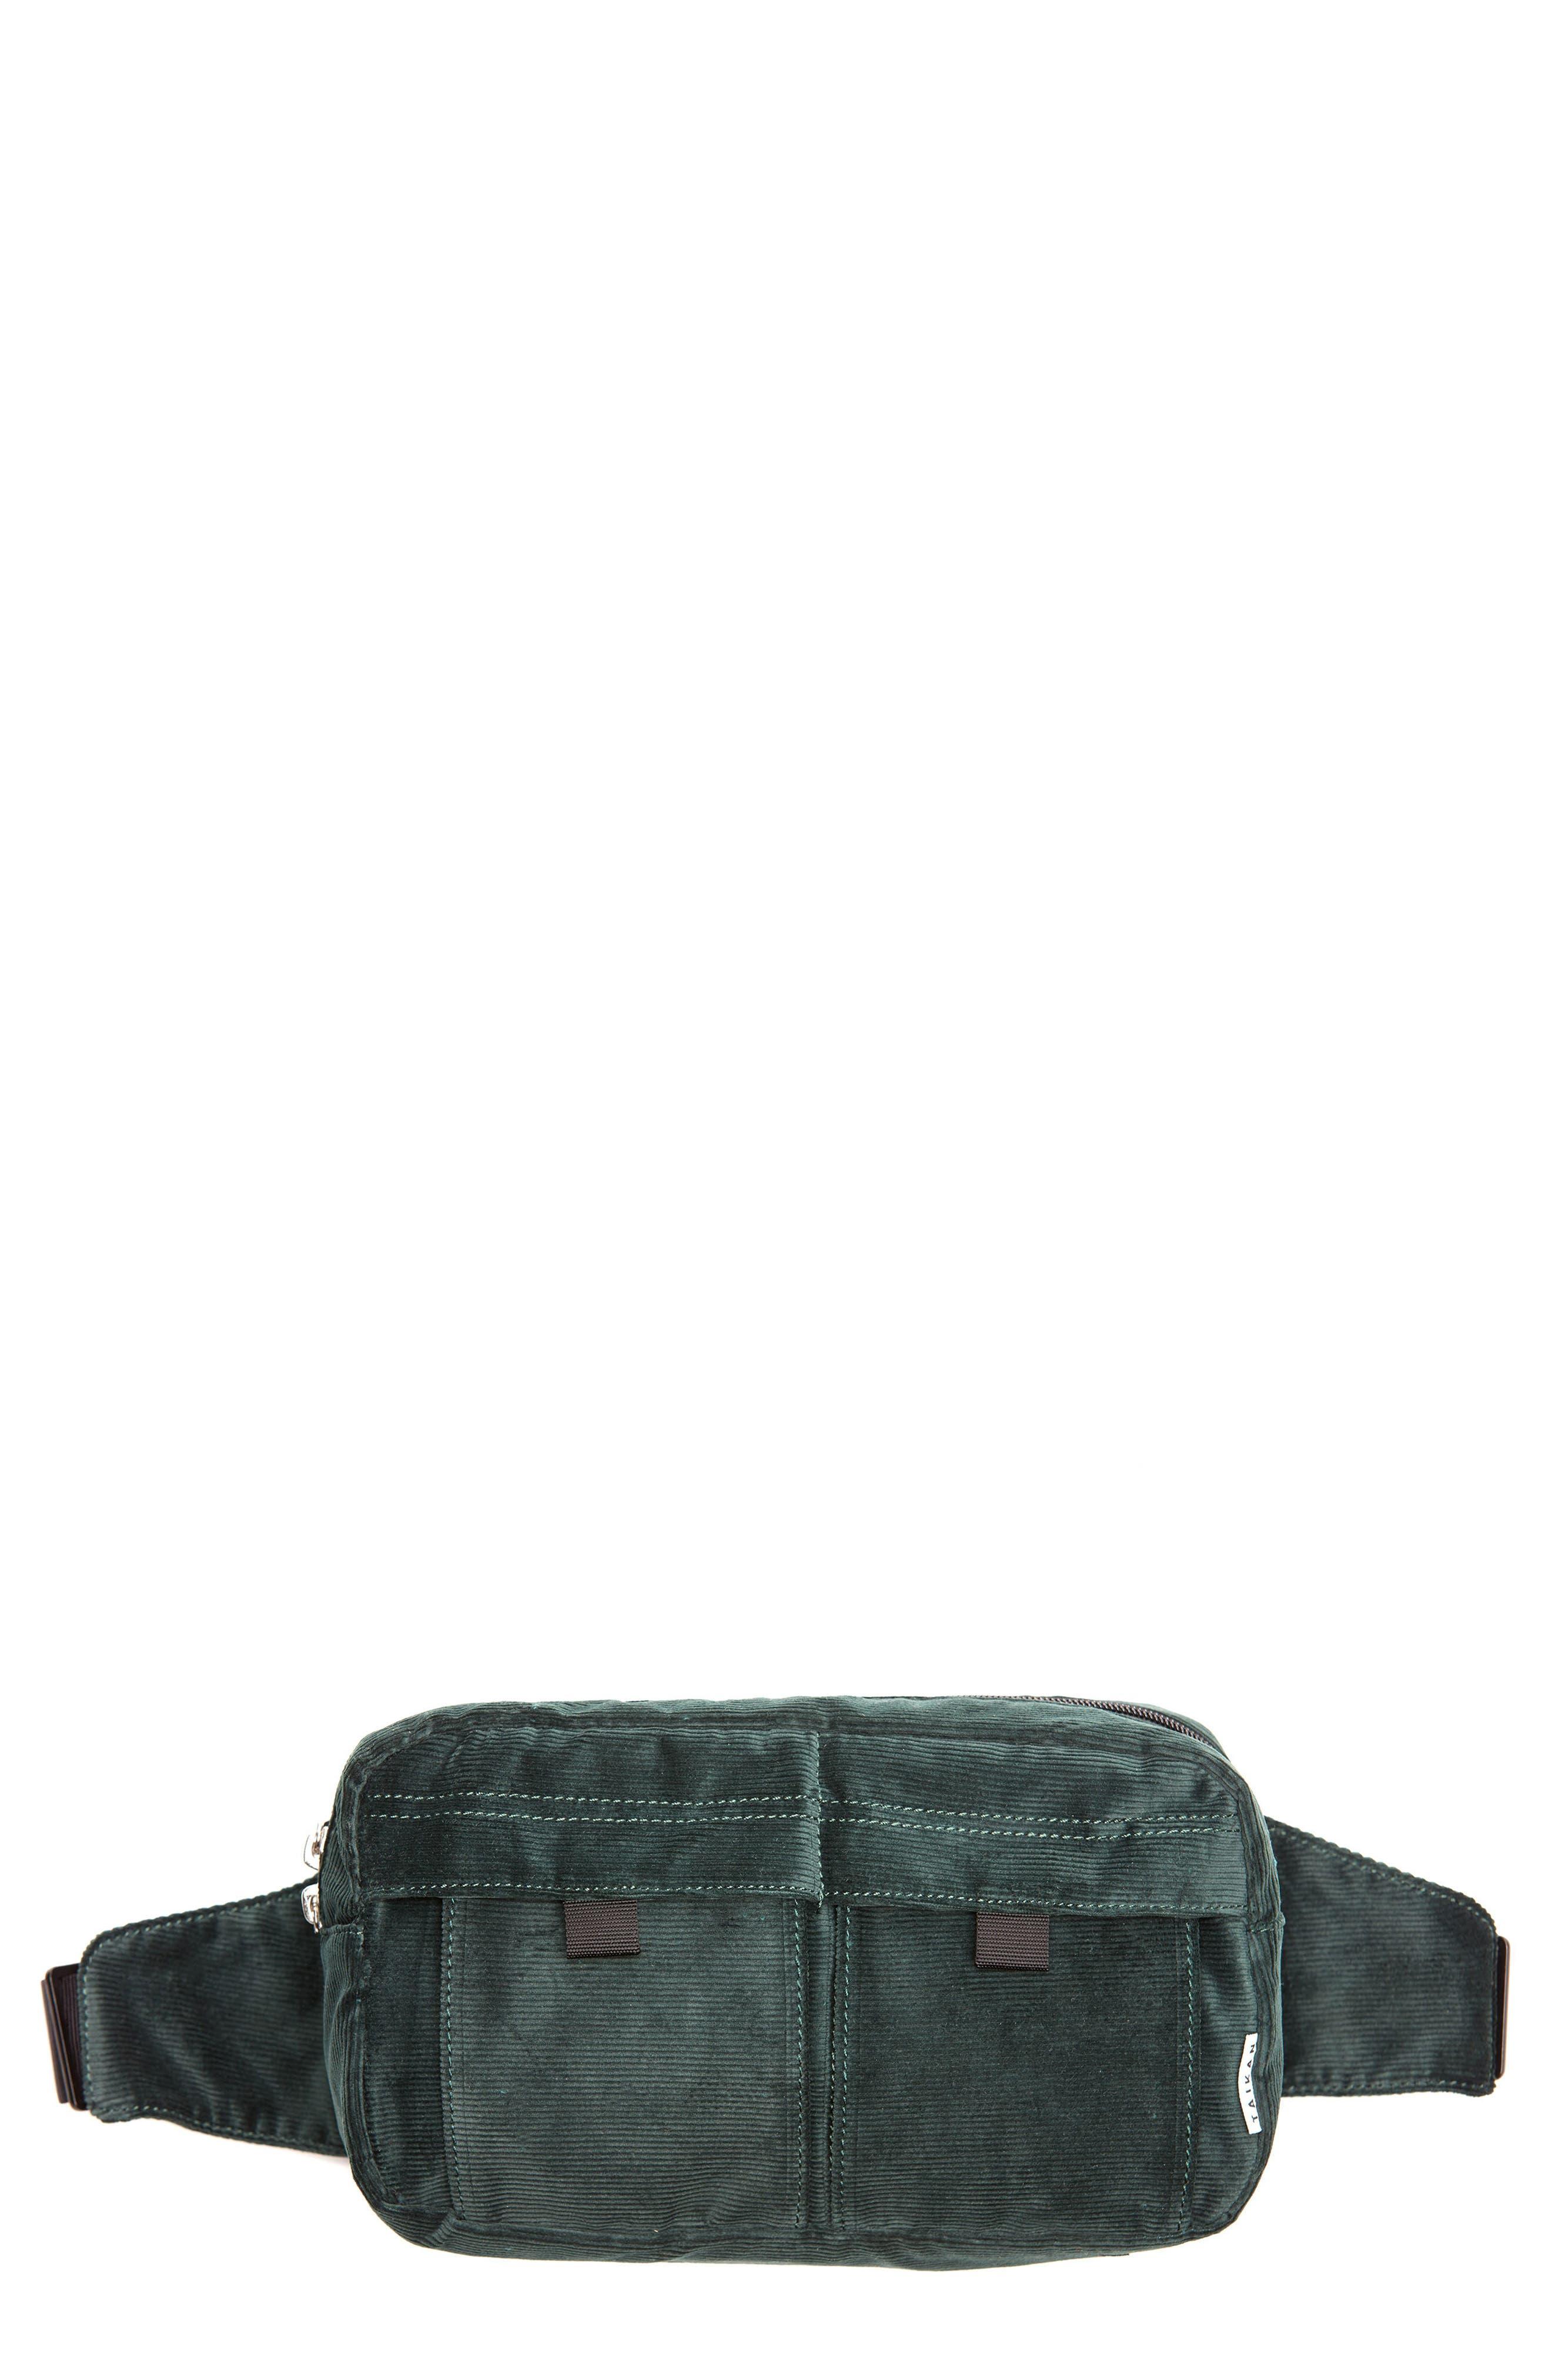 Spectre Corduroy Hip Pack,                         Main,                         color, Forest Corduroy